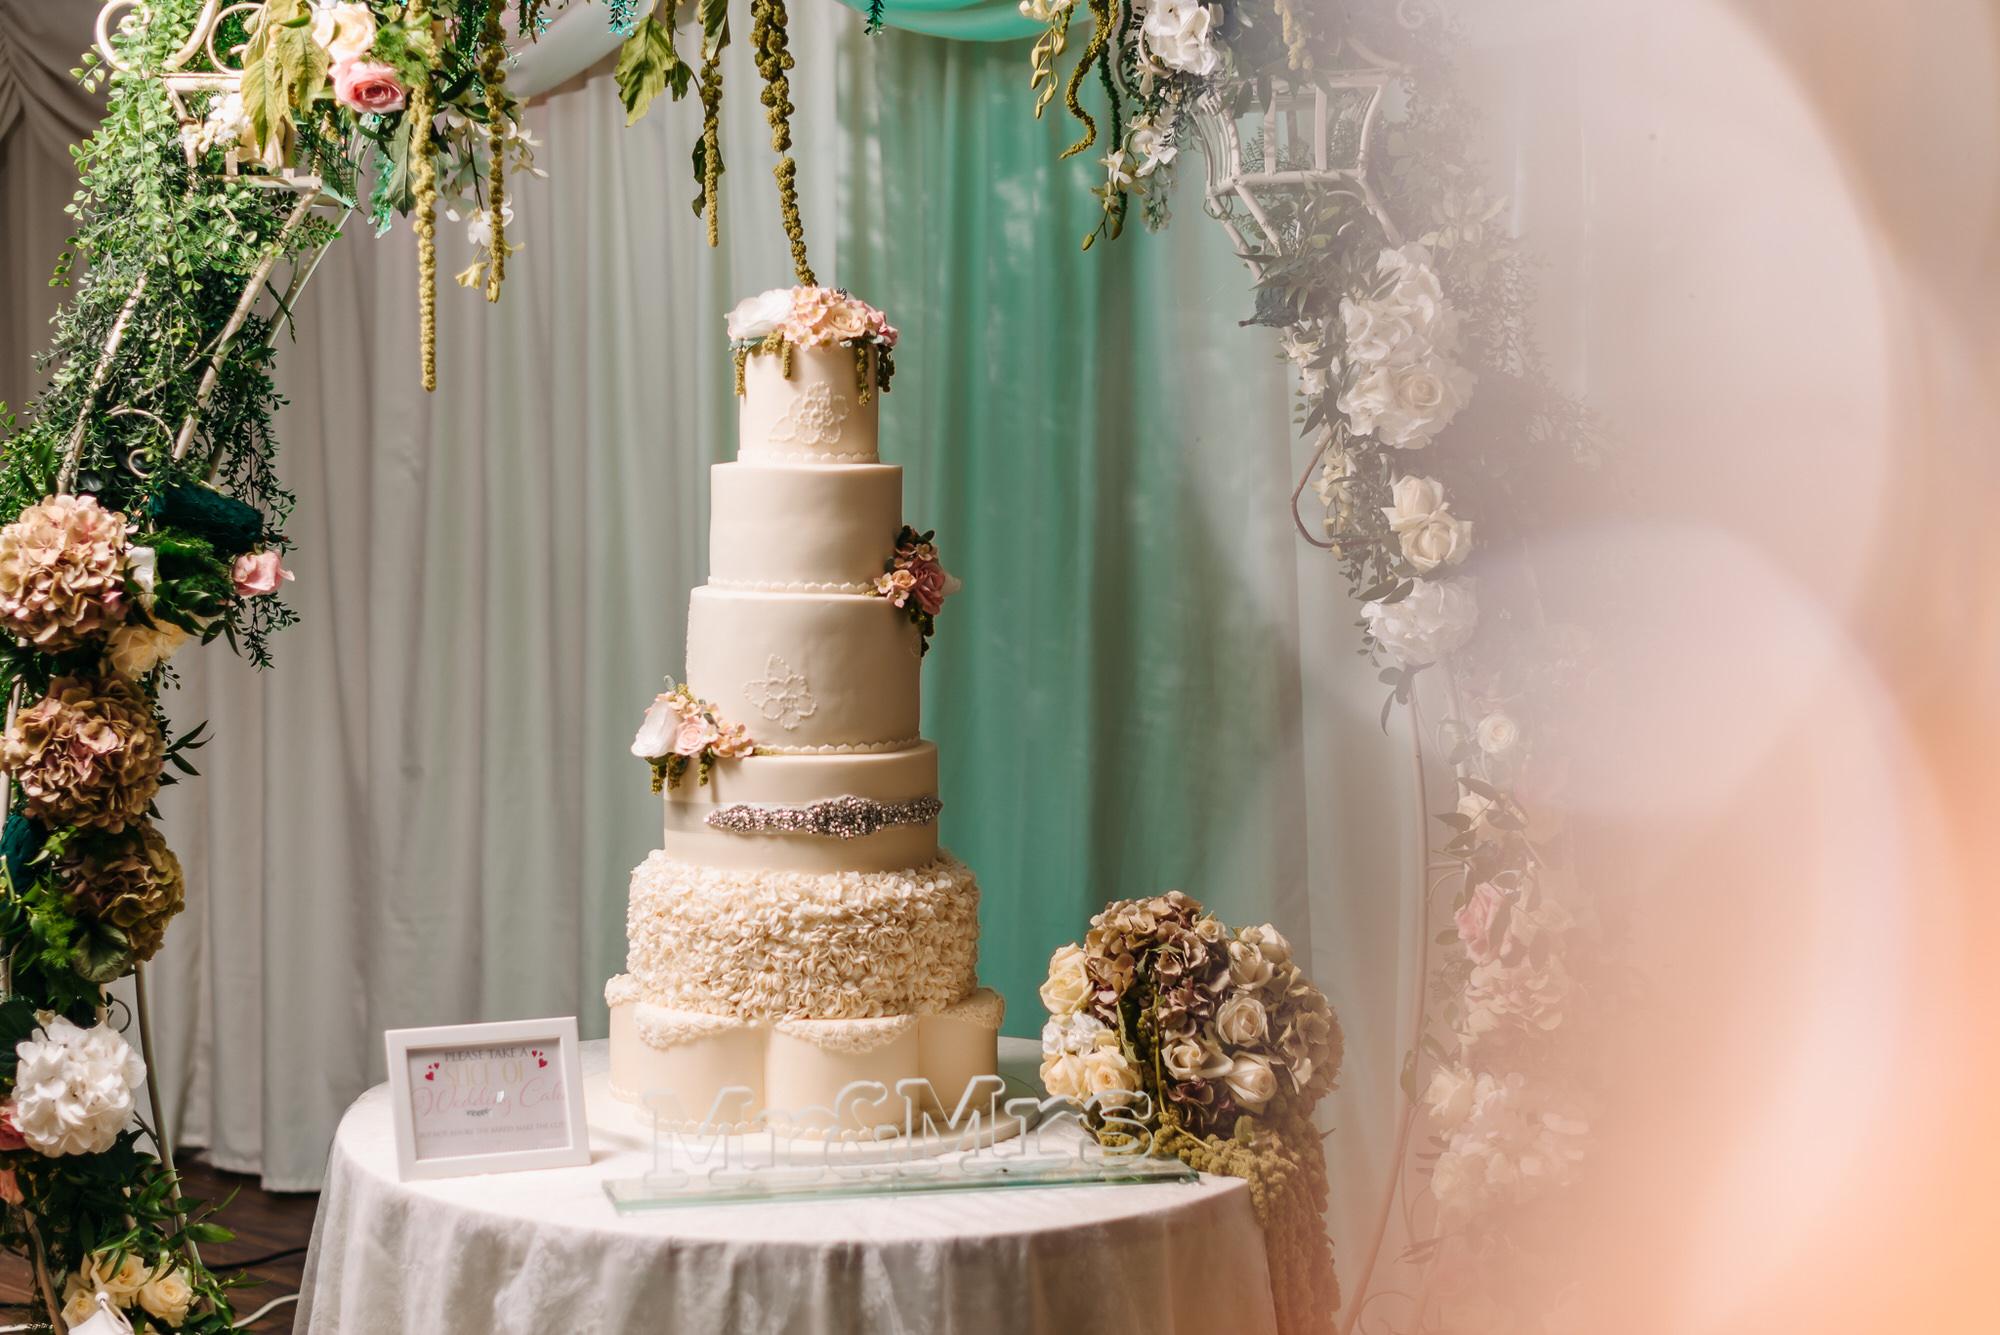 Best Of Yorkshire Wedding Photography 2017 - Martyn Hand-71.jpg